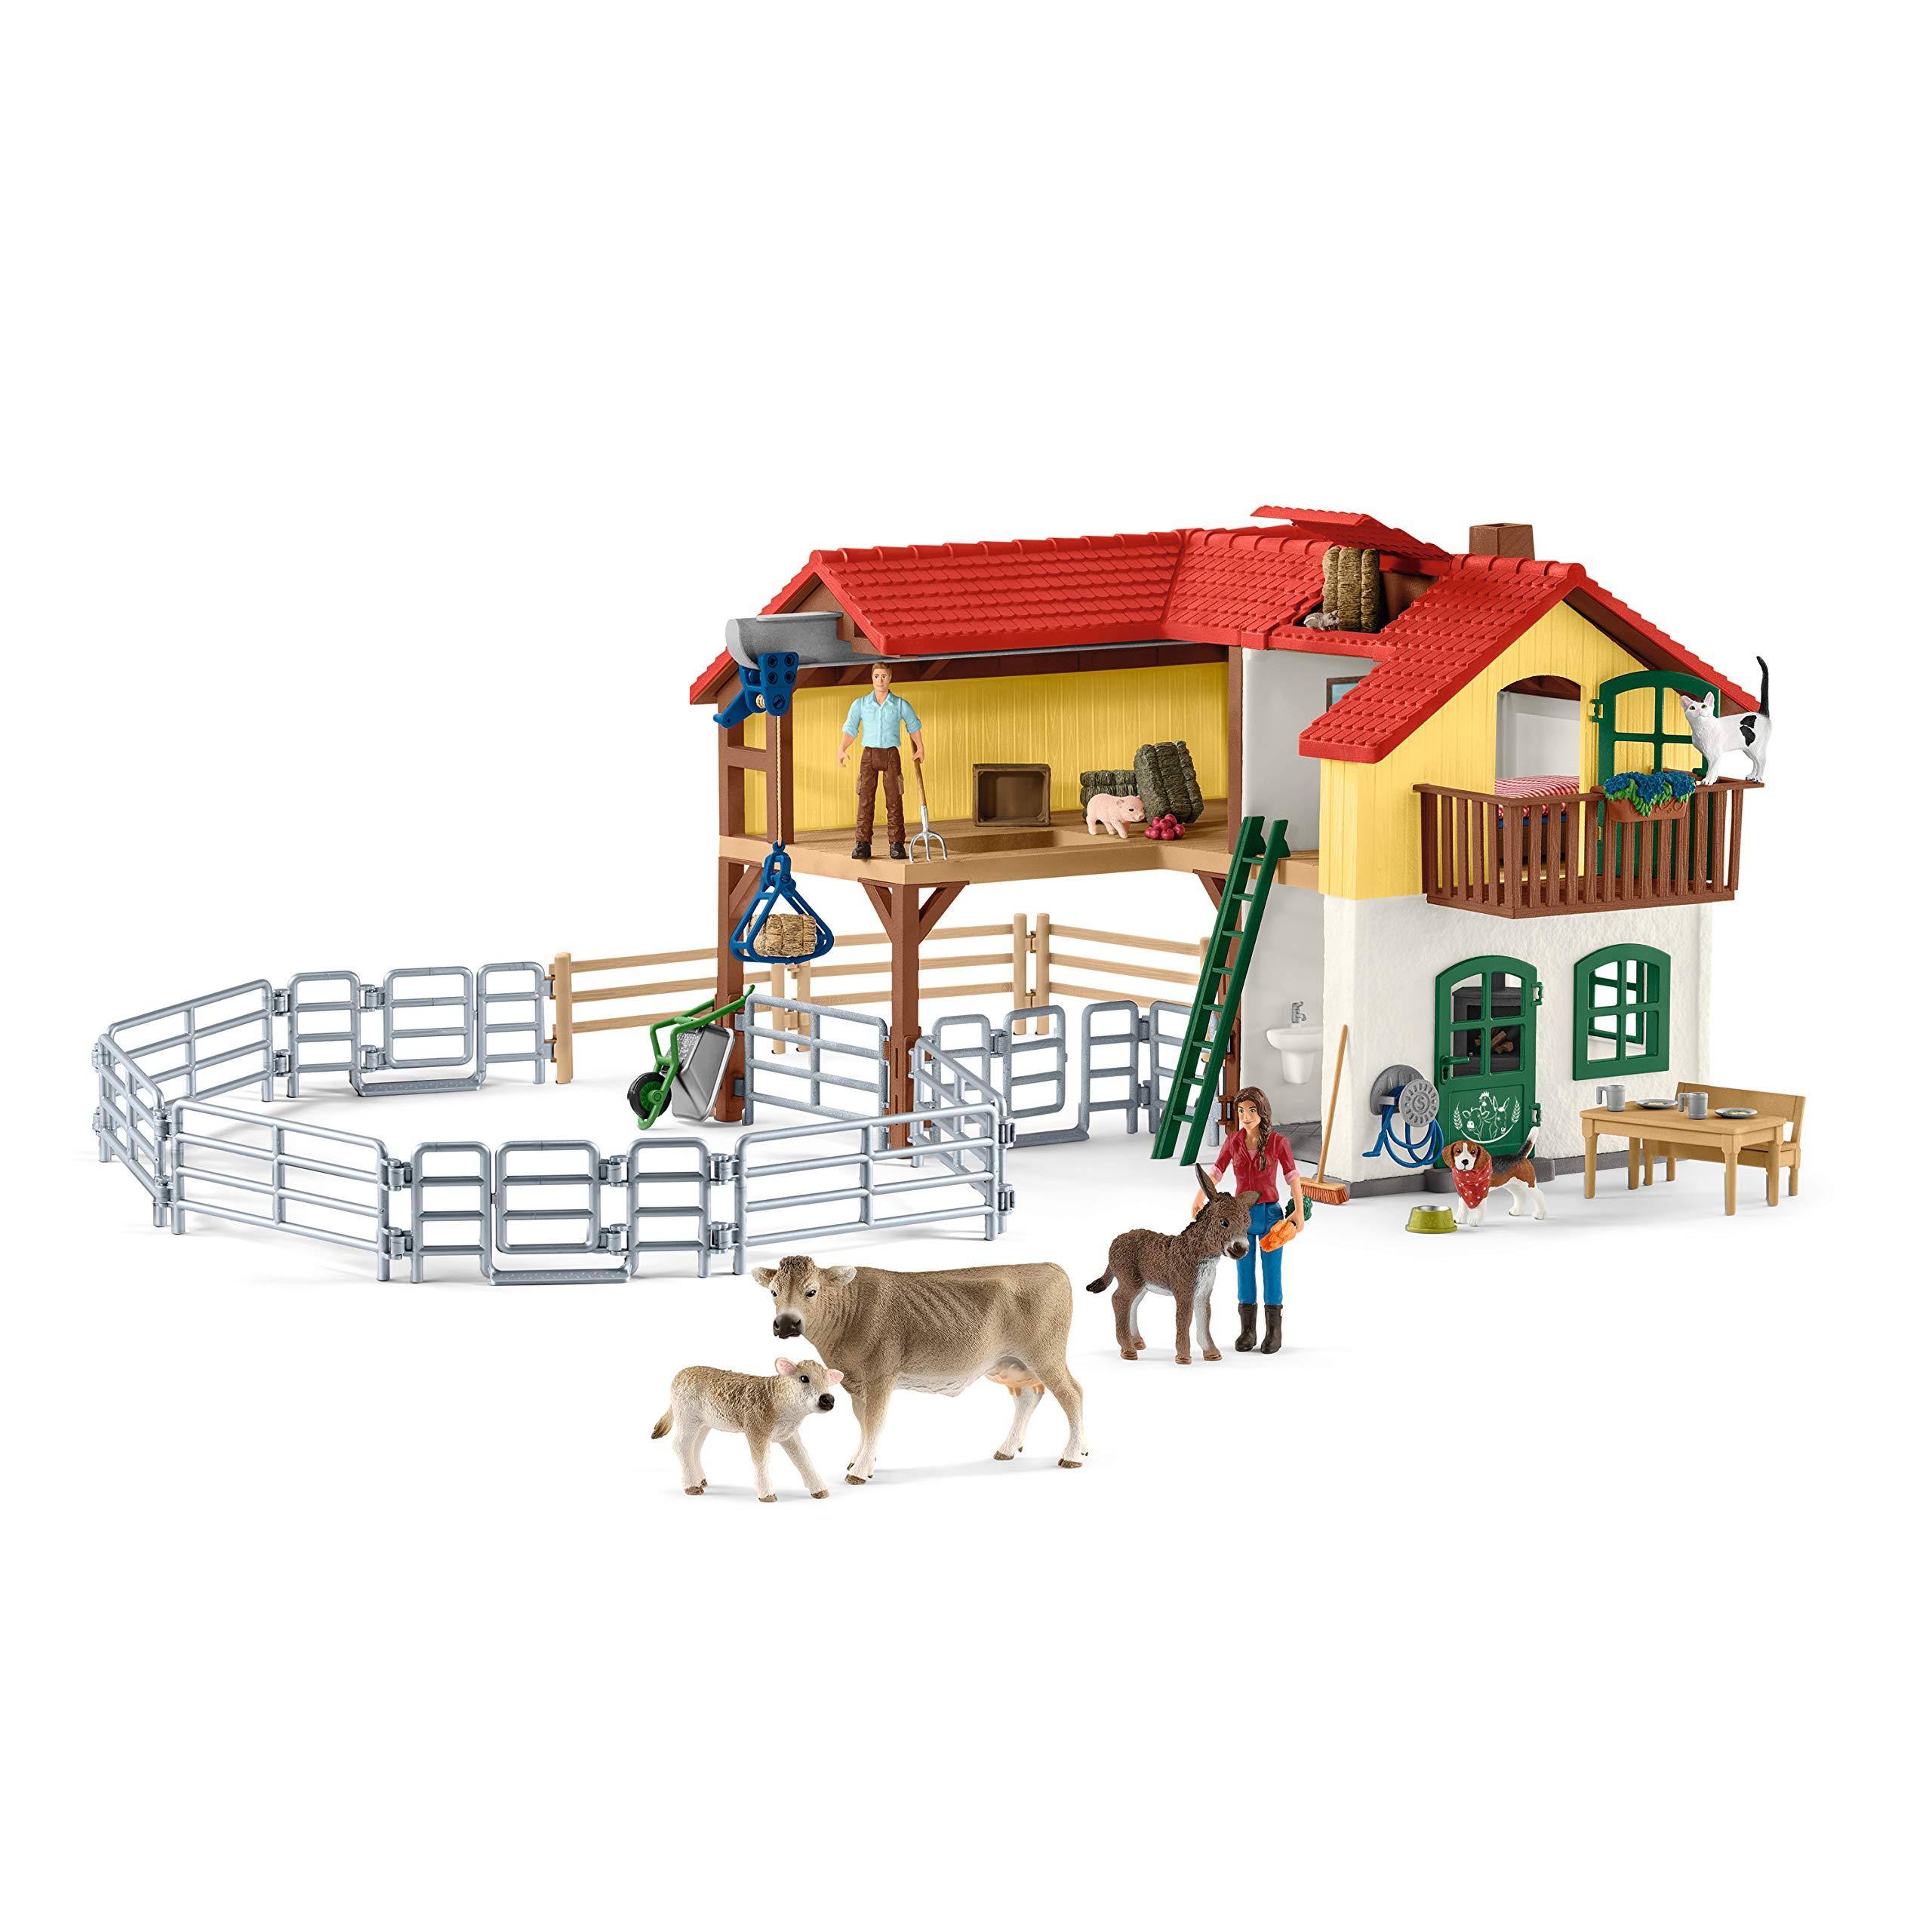 Schleich Large Farm House by Schleich (Image #15)